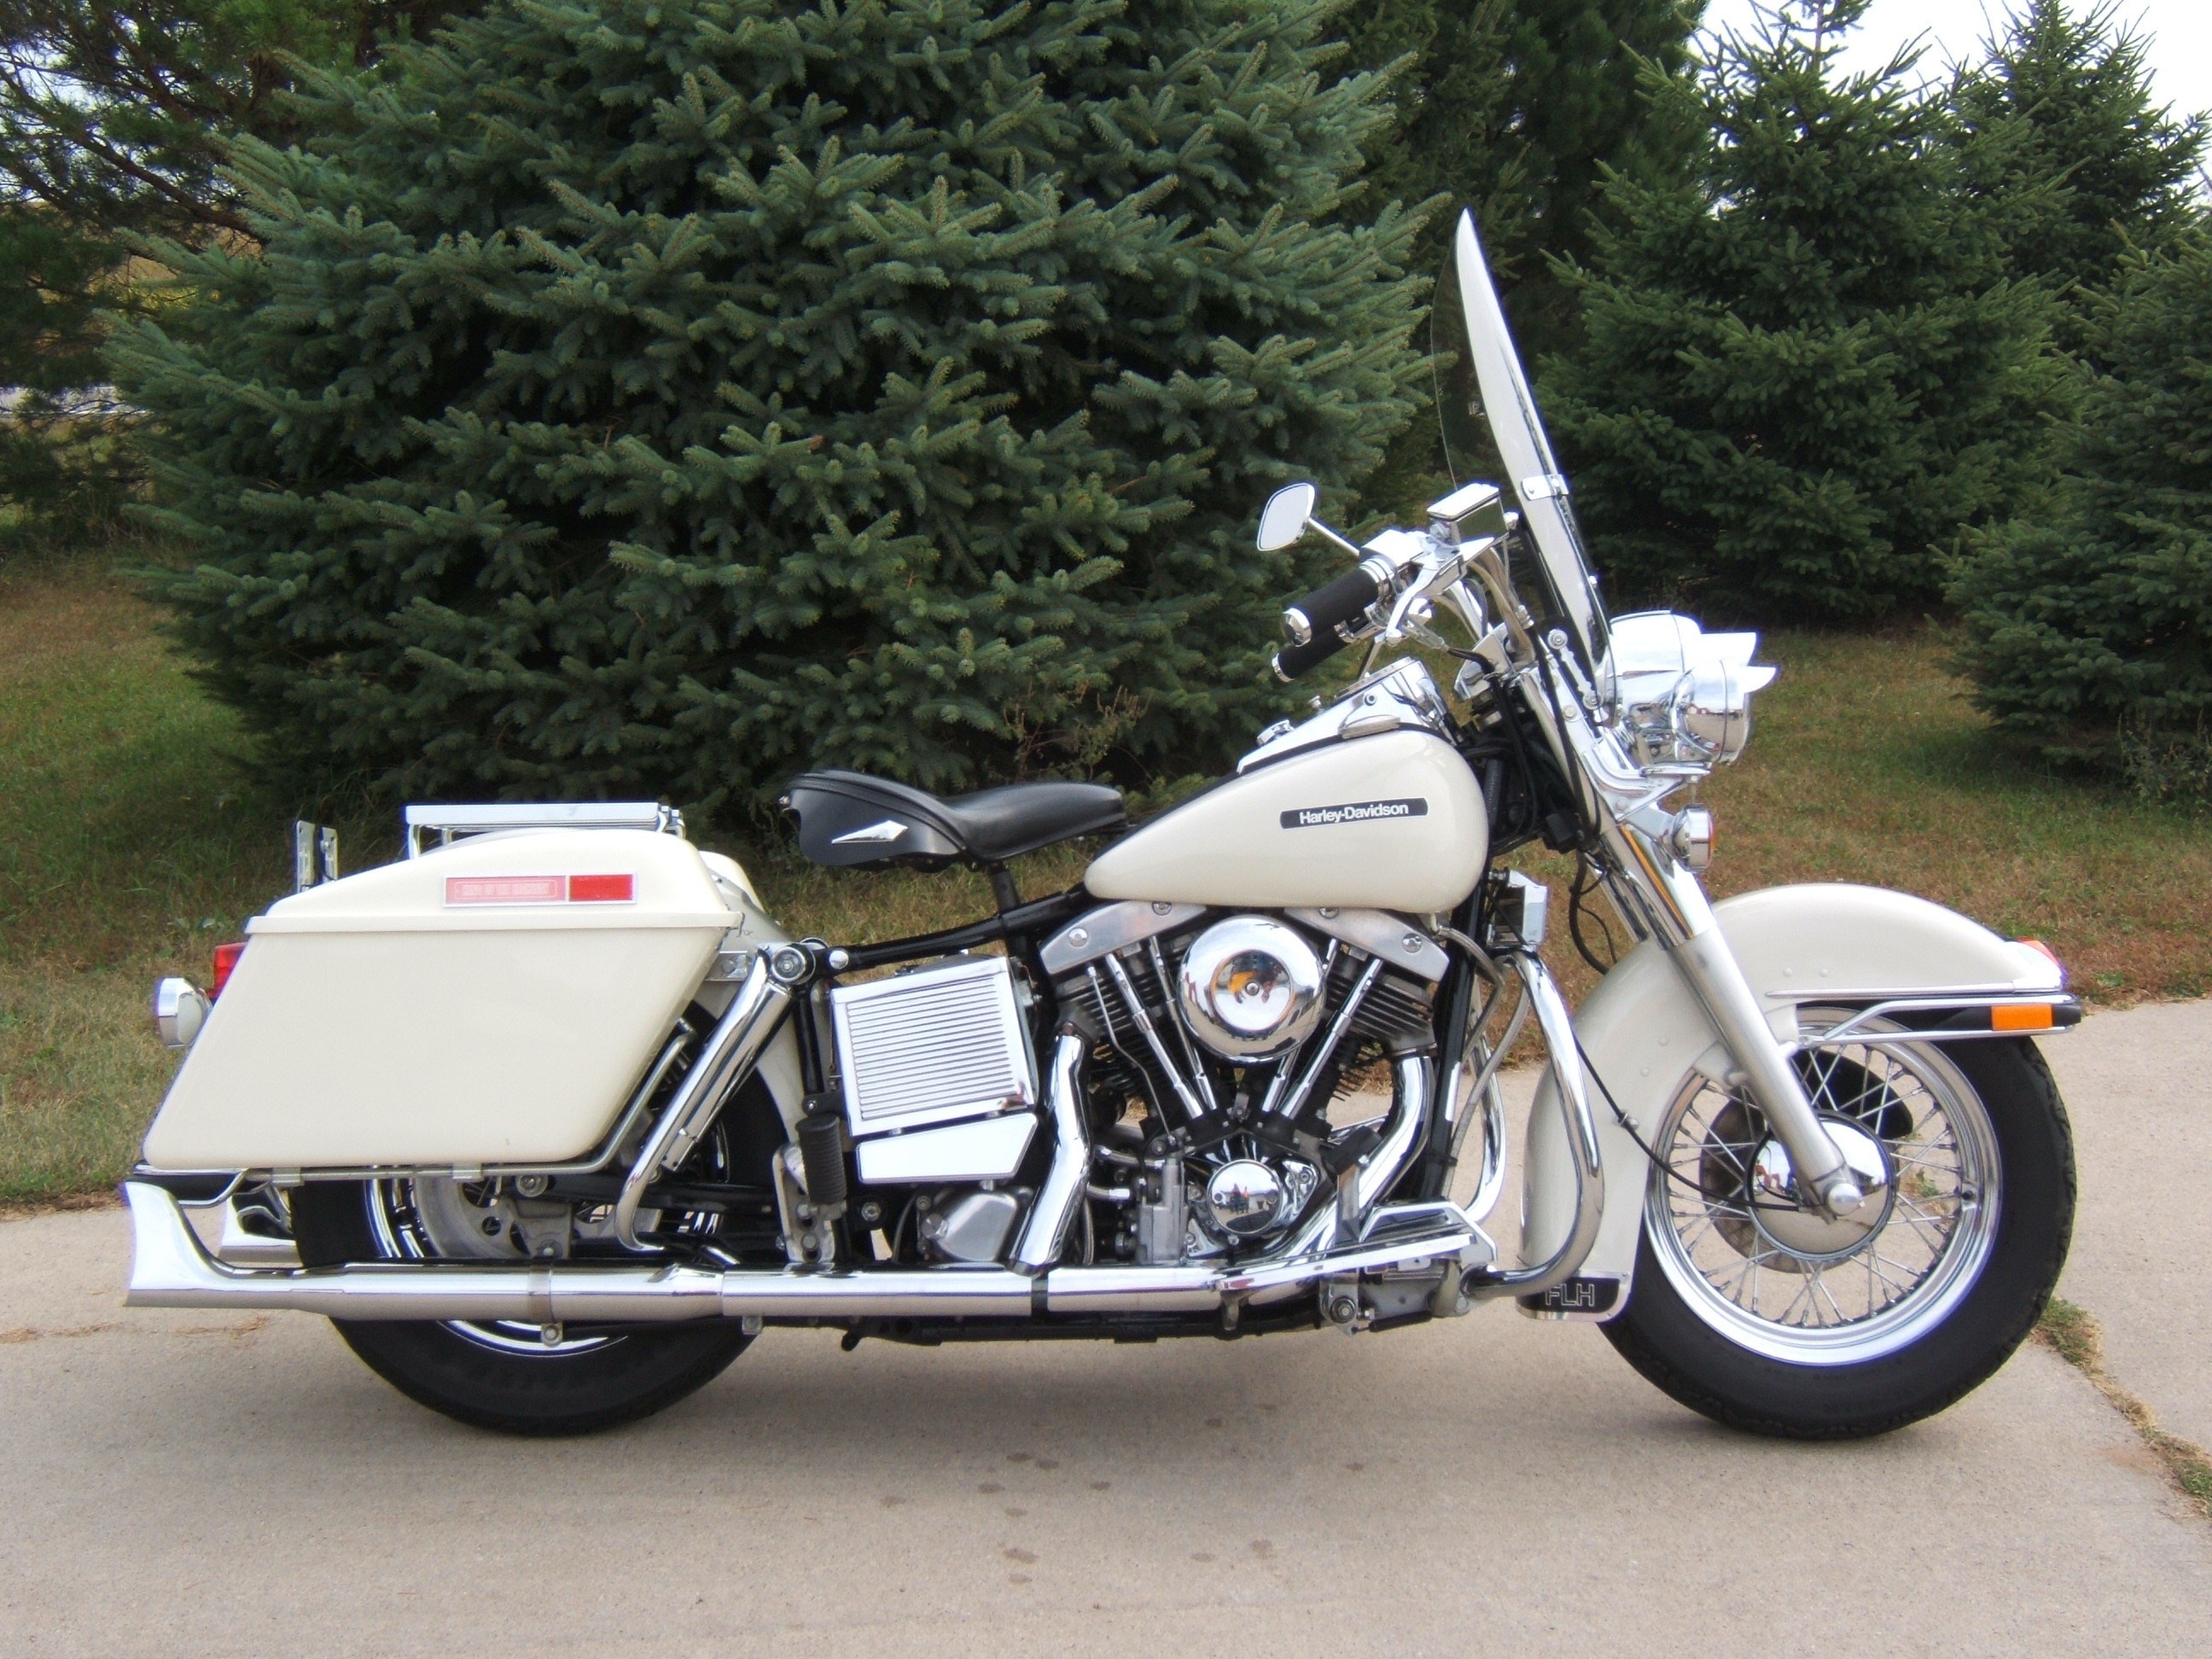 White Harley Davidson: 1984 Harley-Davidson® FLH Electra Glide® (Birch White